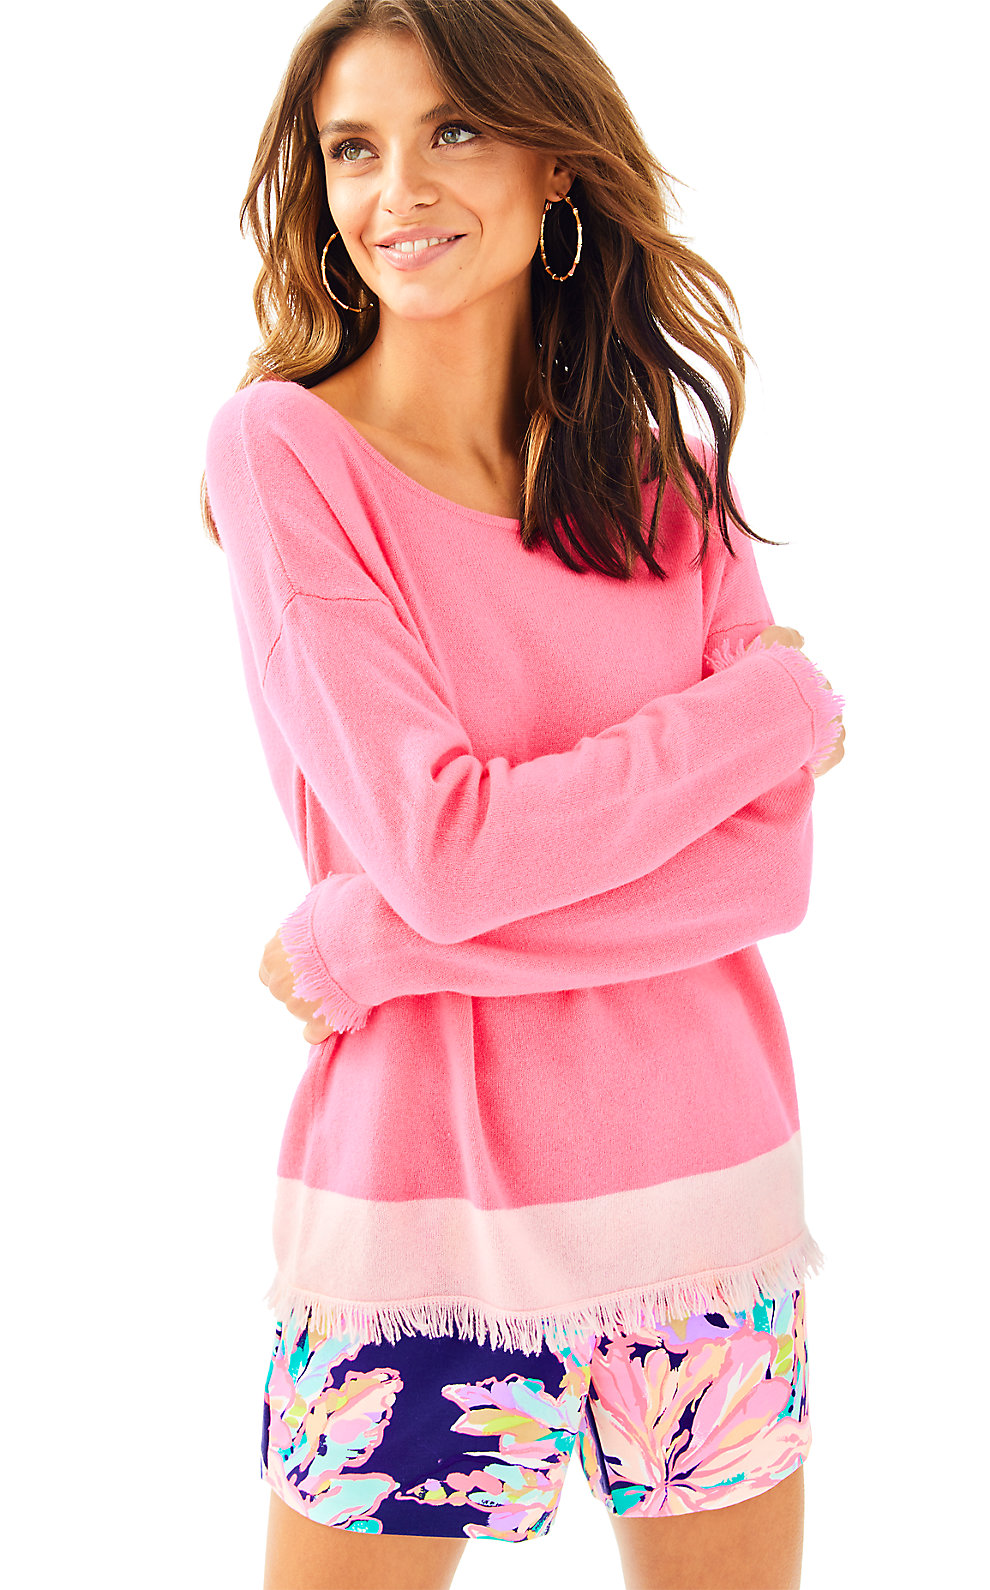 Lilly Pulitzer Fairfax Cashmere Sweater